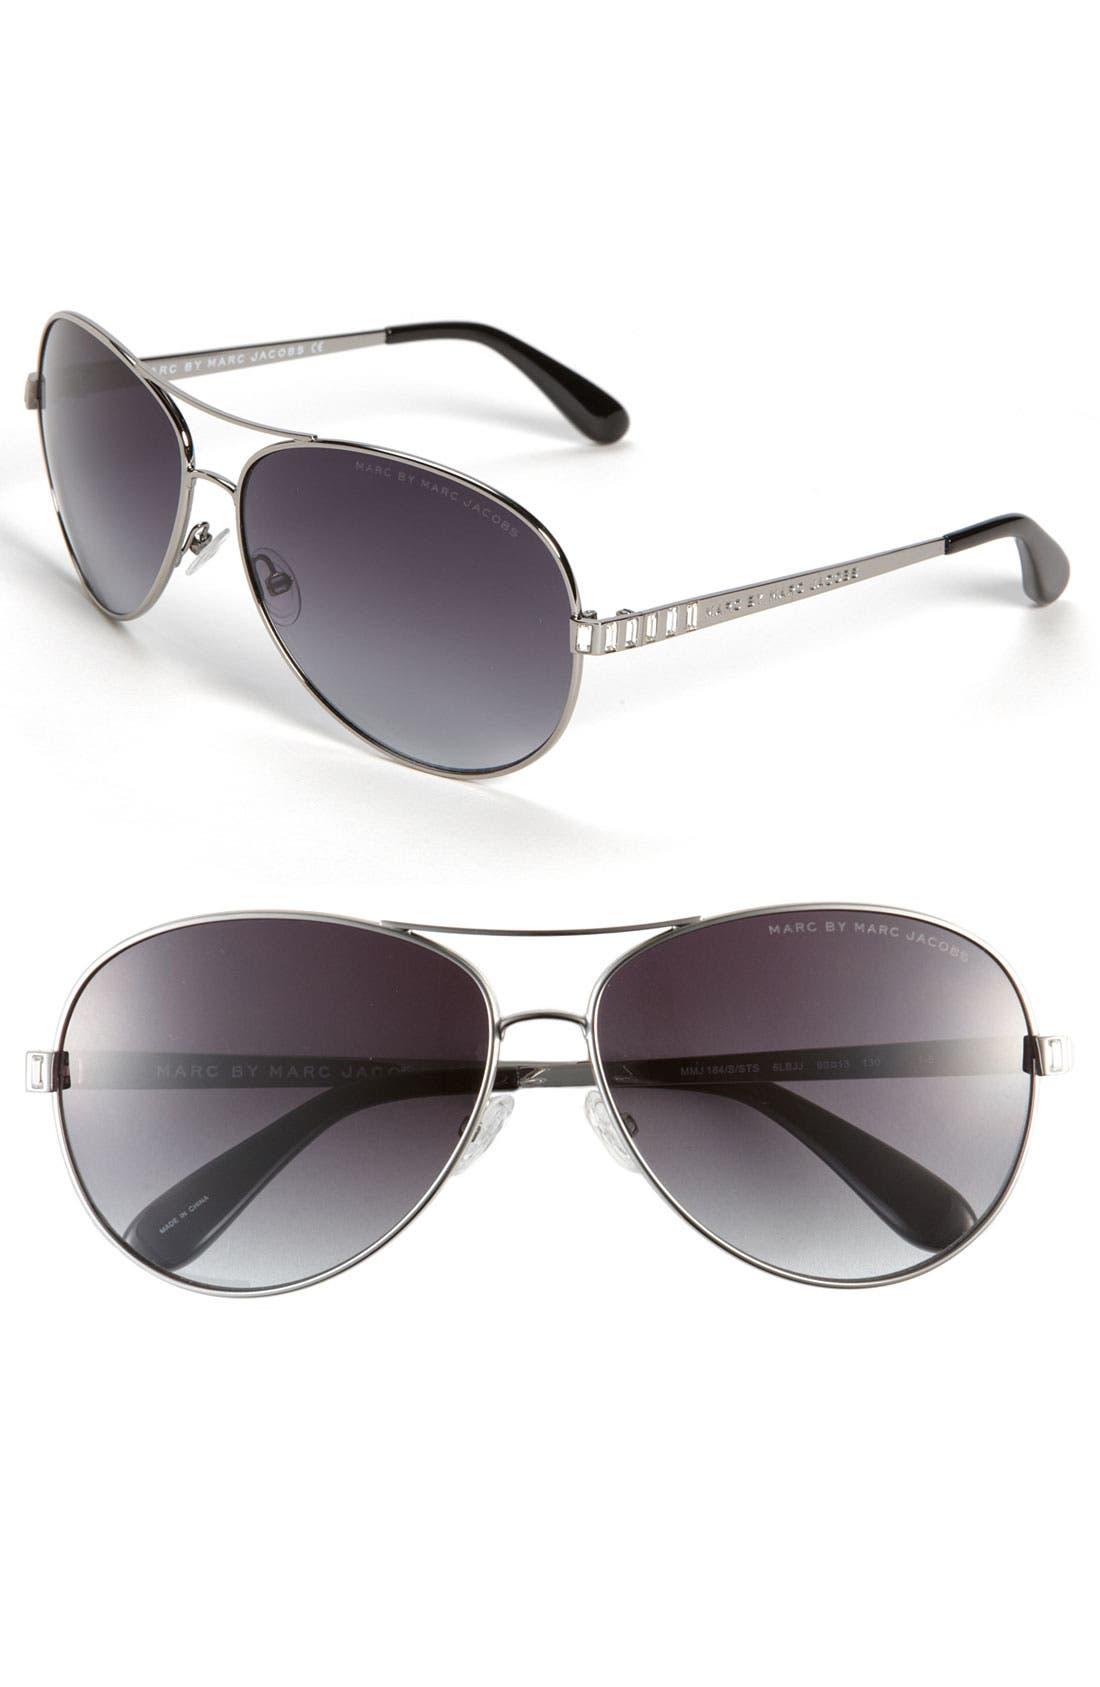 60mm Aviator Sunglasses,                             Main thumbnail 1, color,                             020